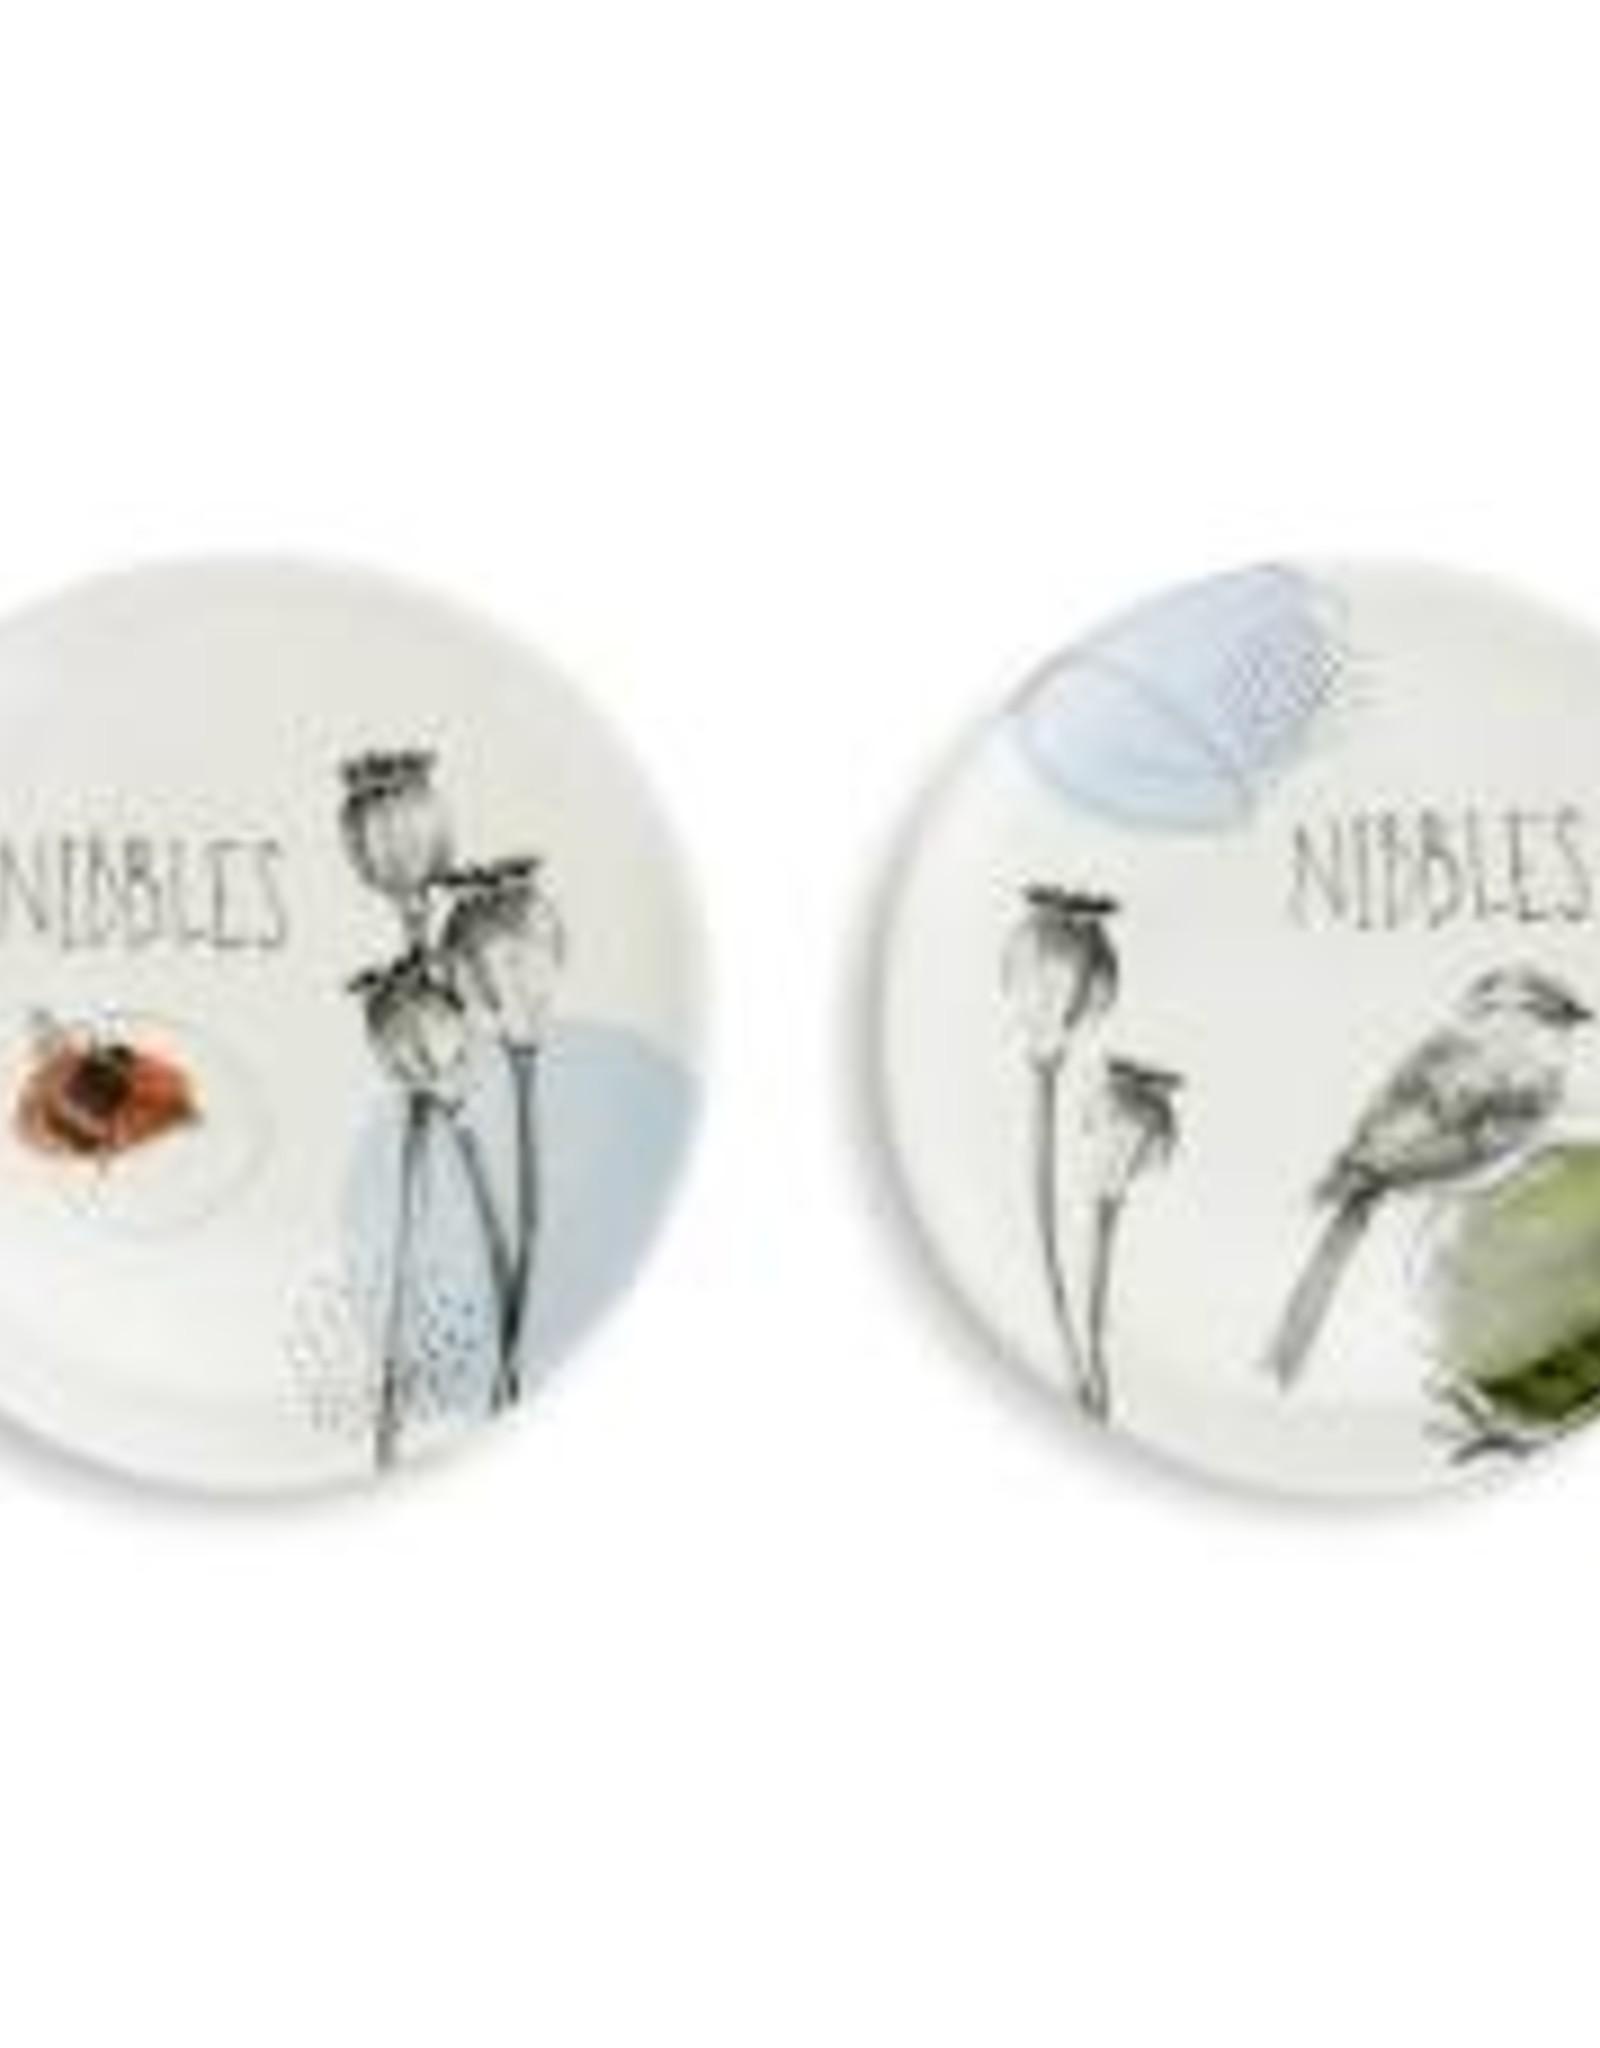 Appetizer Plates, Set of 2, Nibbles